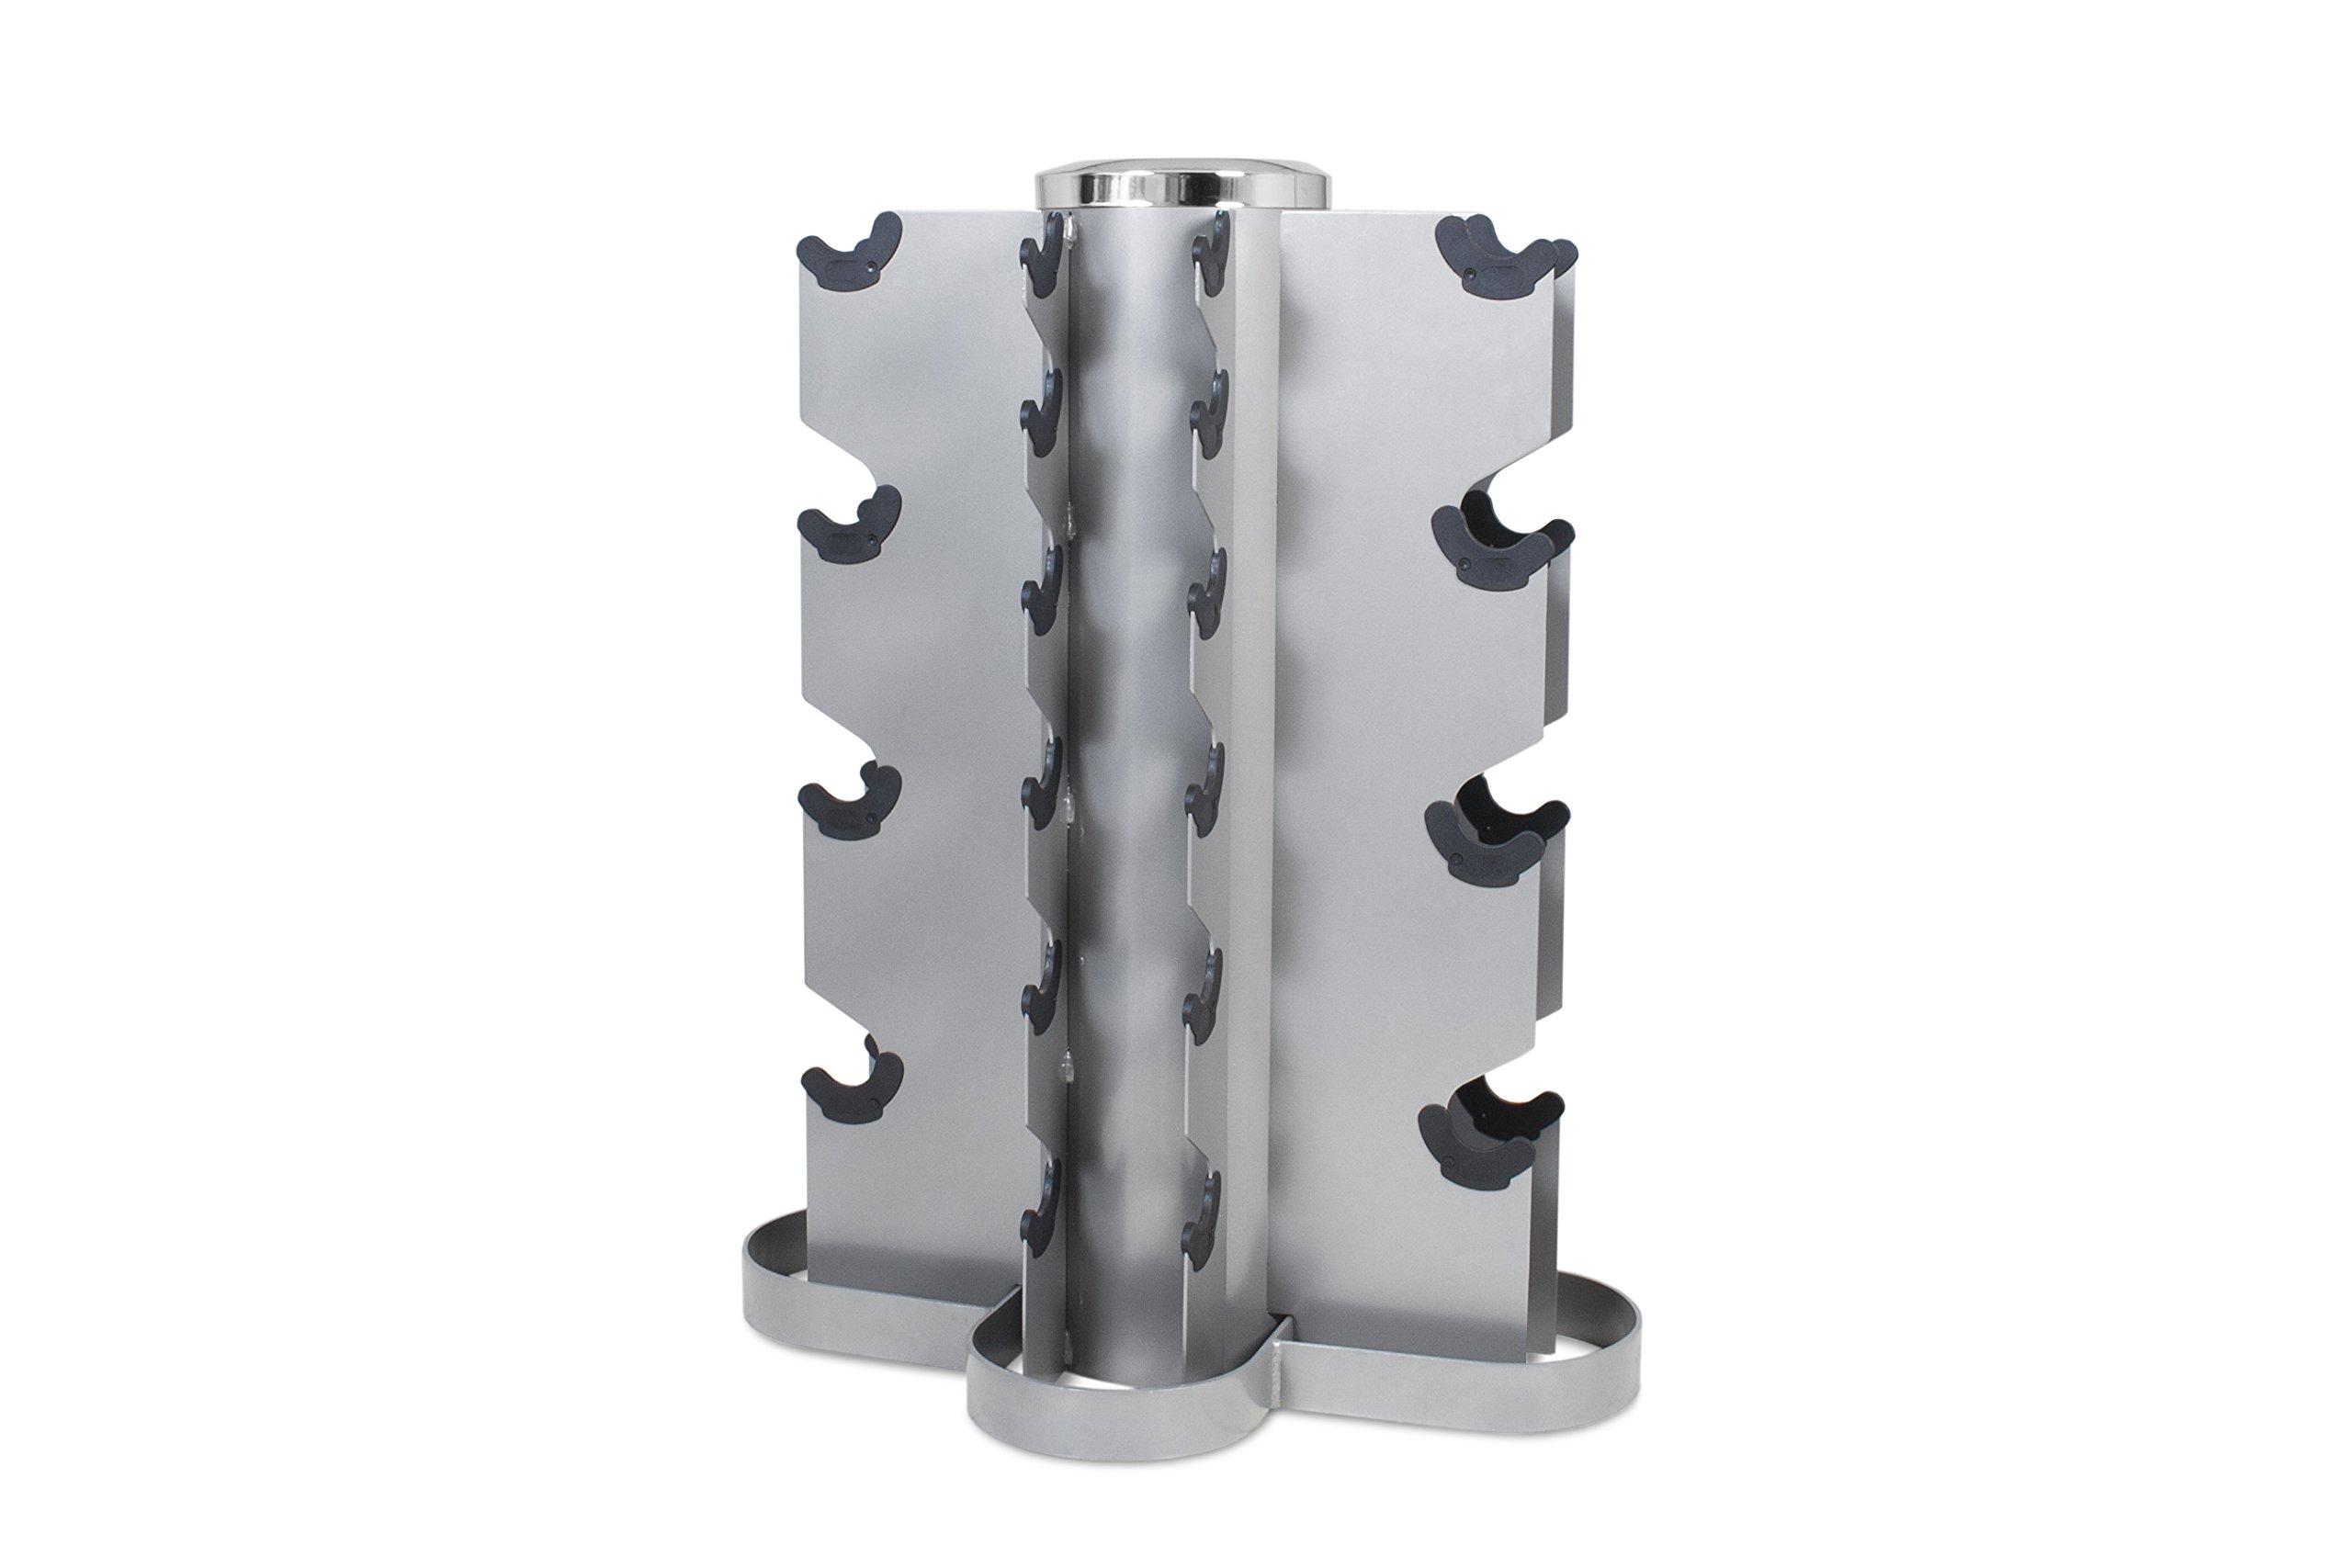 Hastings - DR-04 Vertical Dumbbell Rack 2-20kg